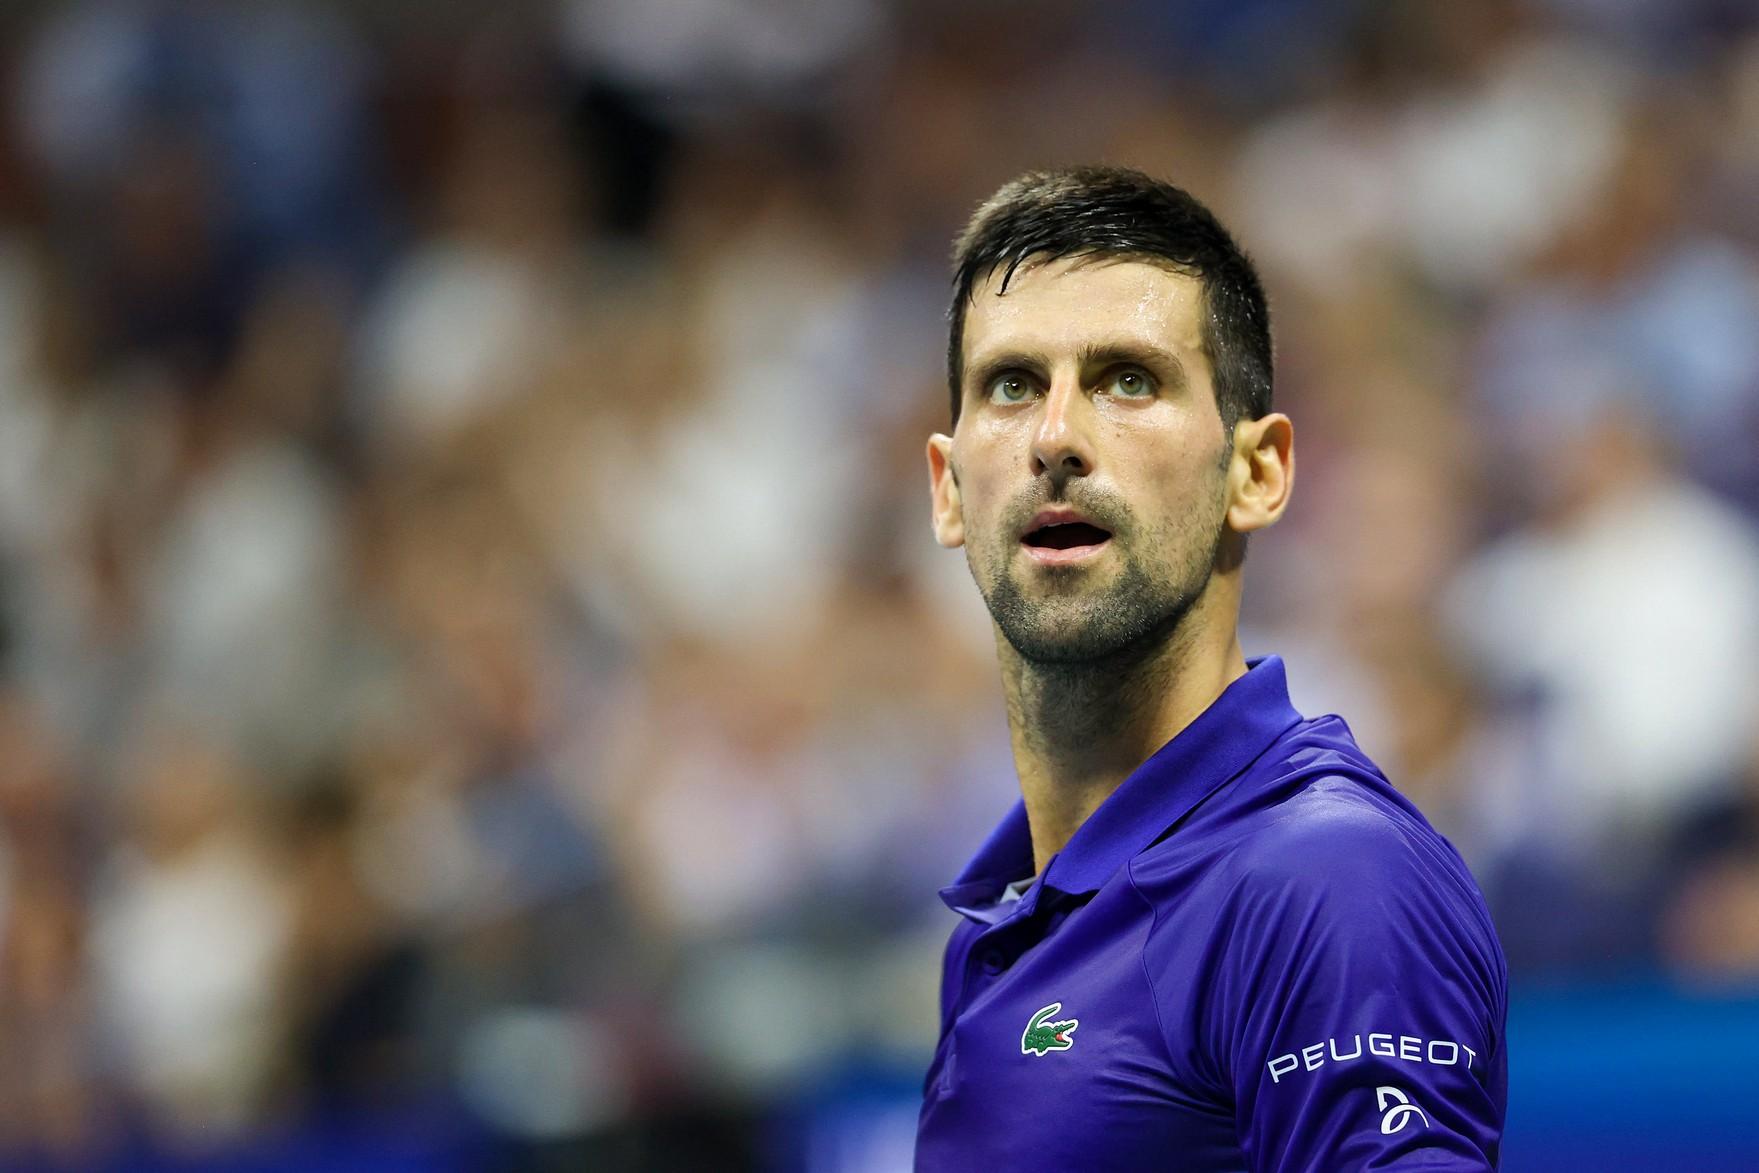 Foto httpswww.tennis.com Matt Fitzgerlad 8 - Prvi igralec sveta ne bo igral v Indian Wellsu